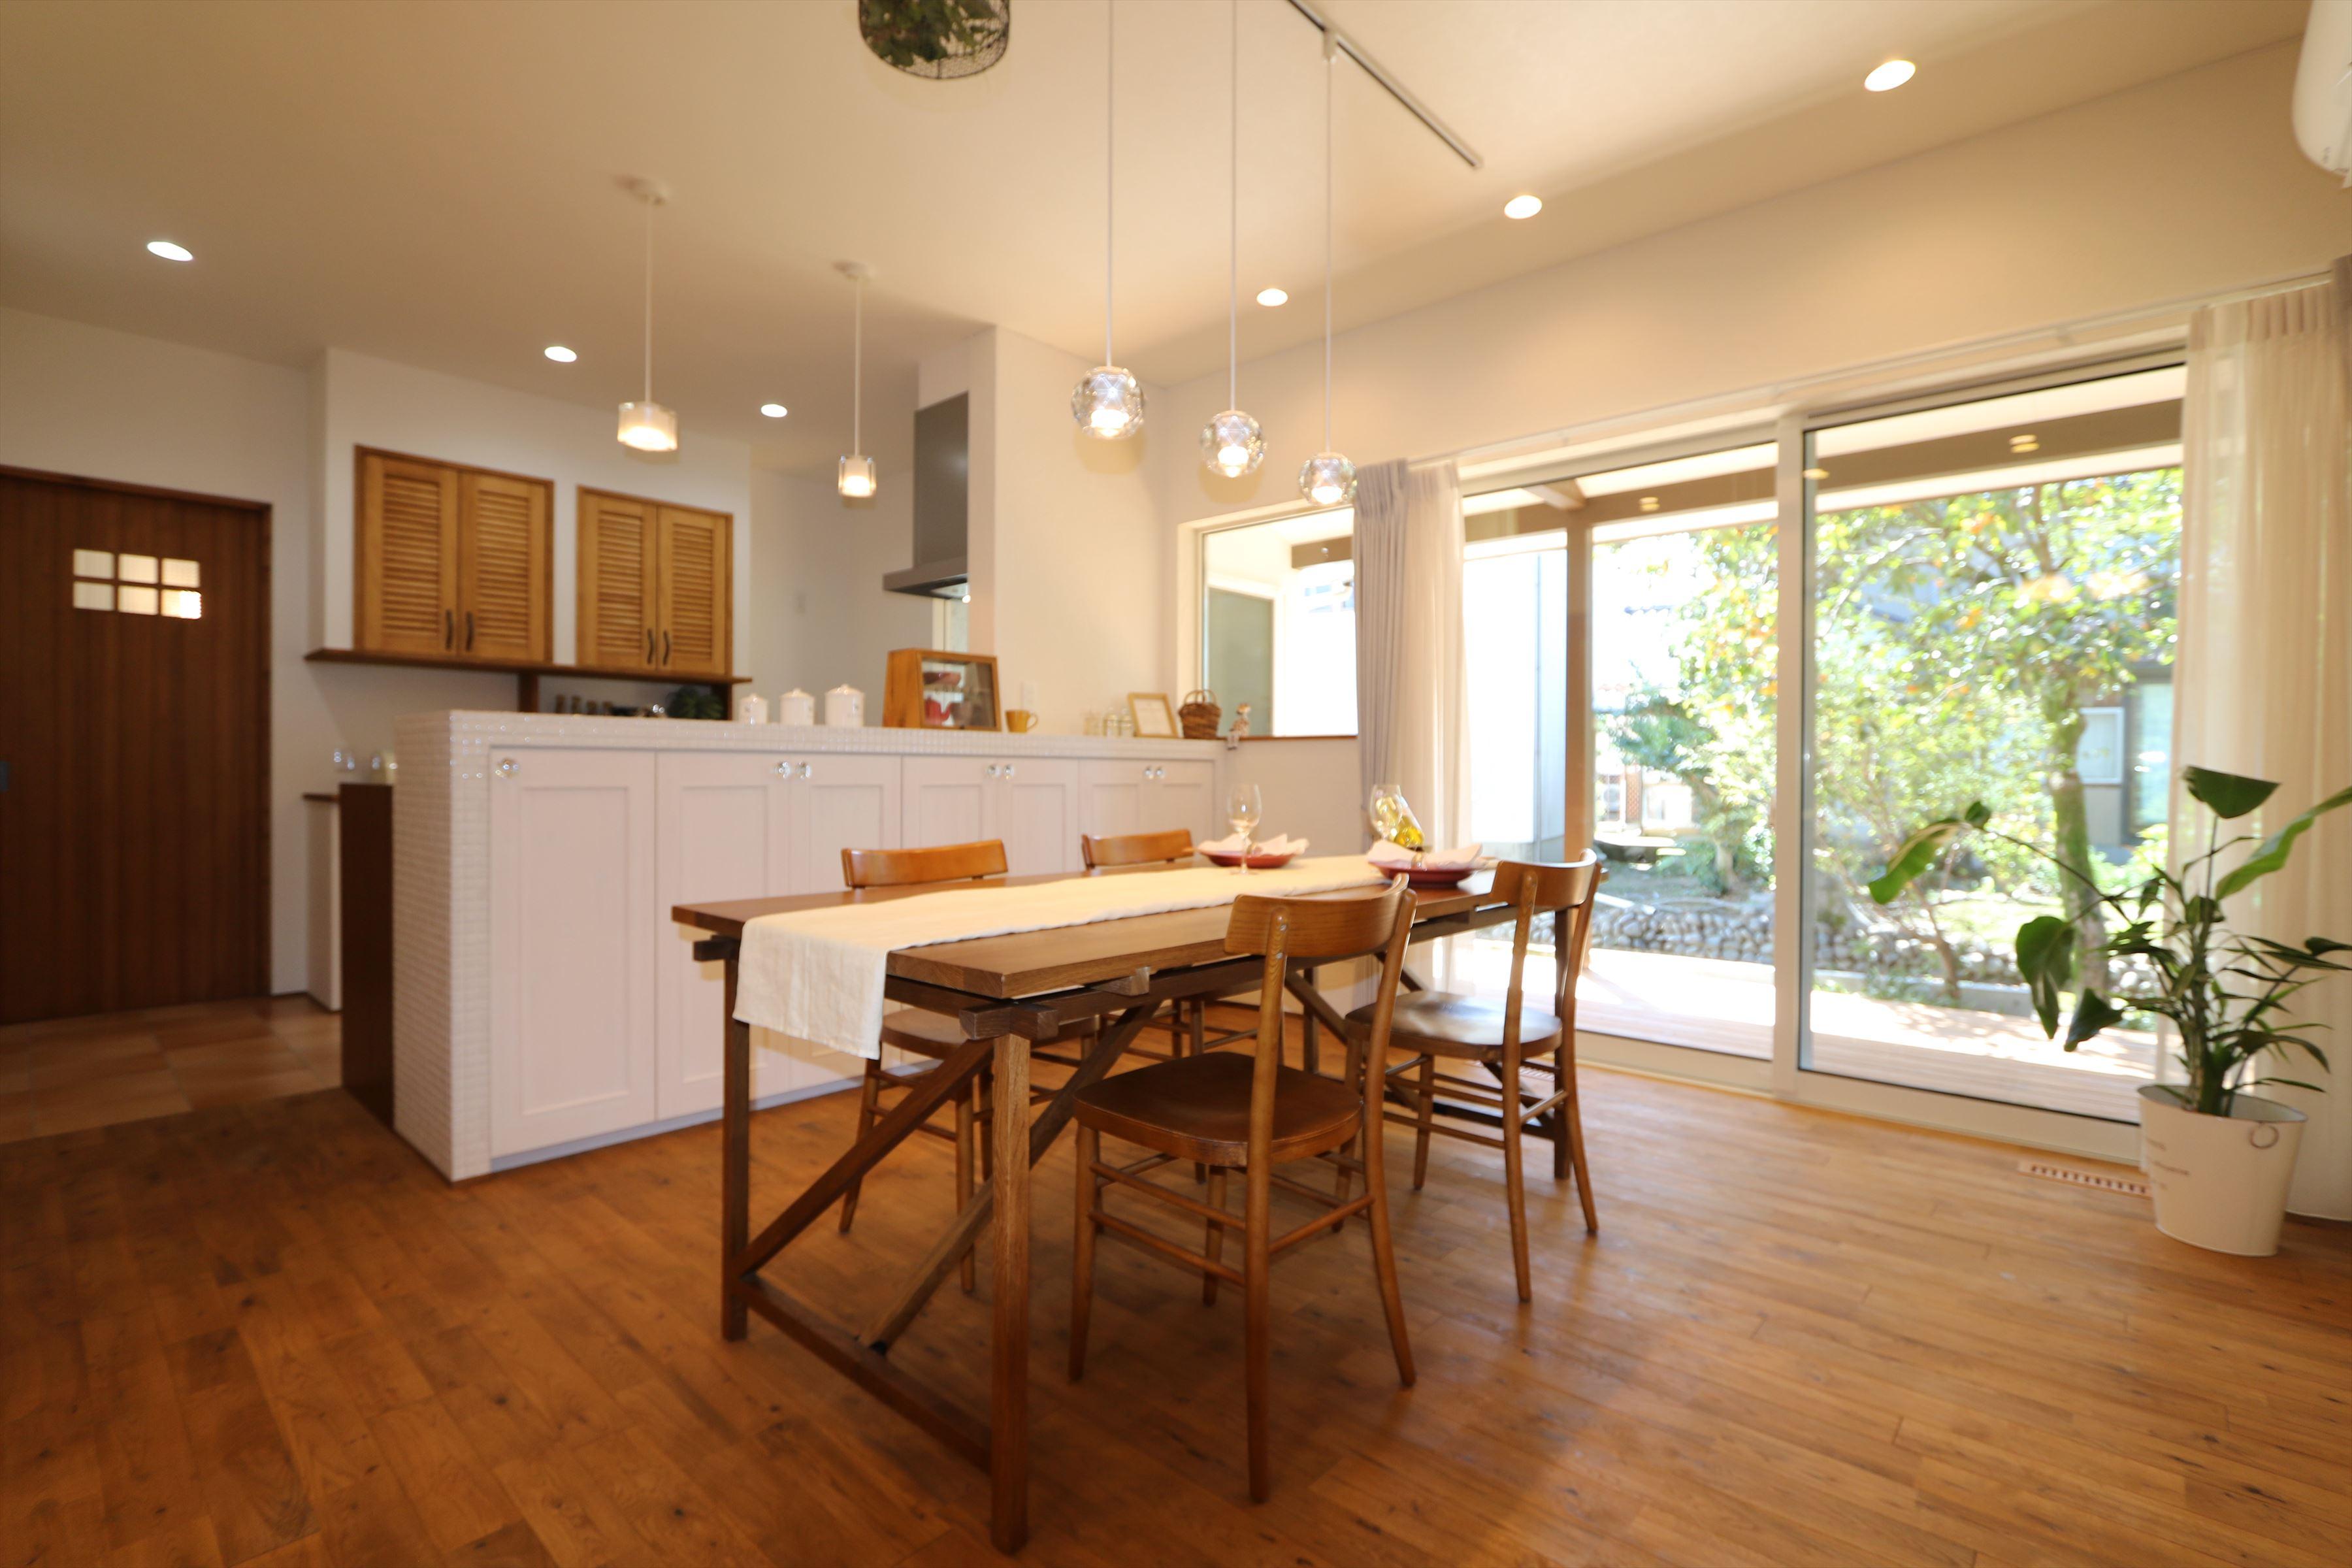 FRENCH STYLE|石川県金沢市の注文住宅・デザイン性・新築の家・戸建て|E-HOUSE